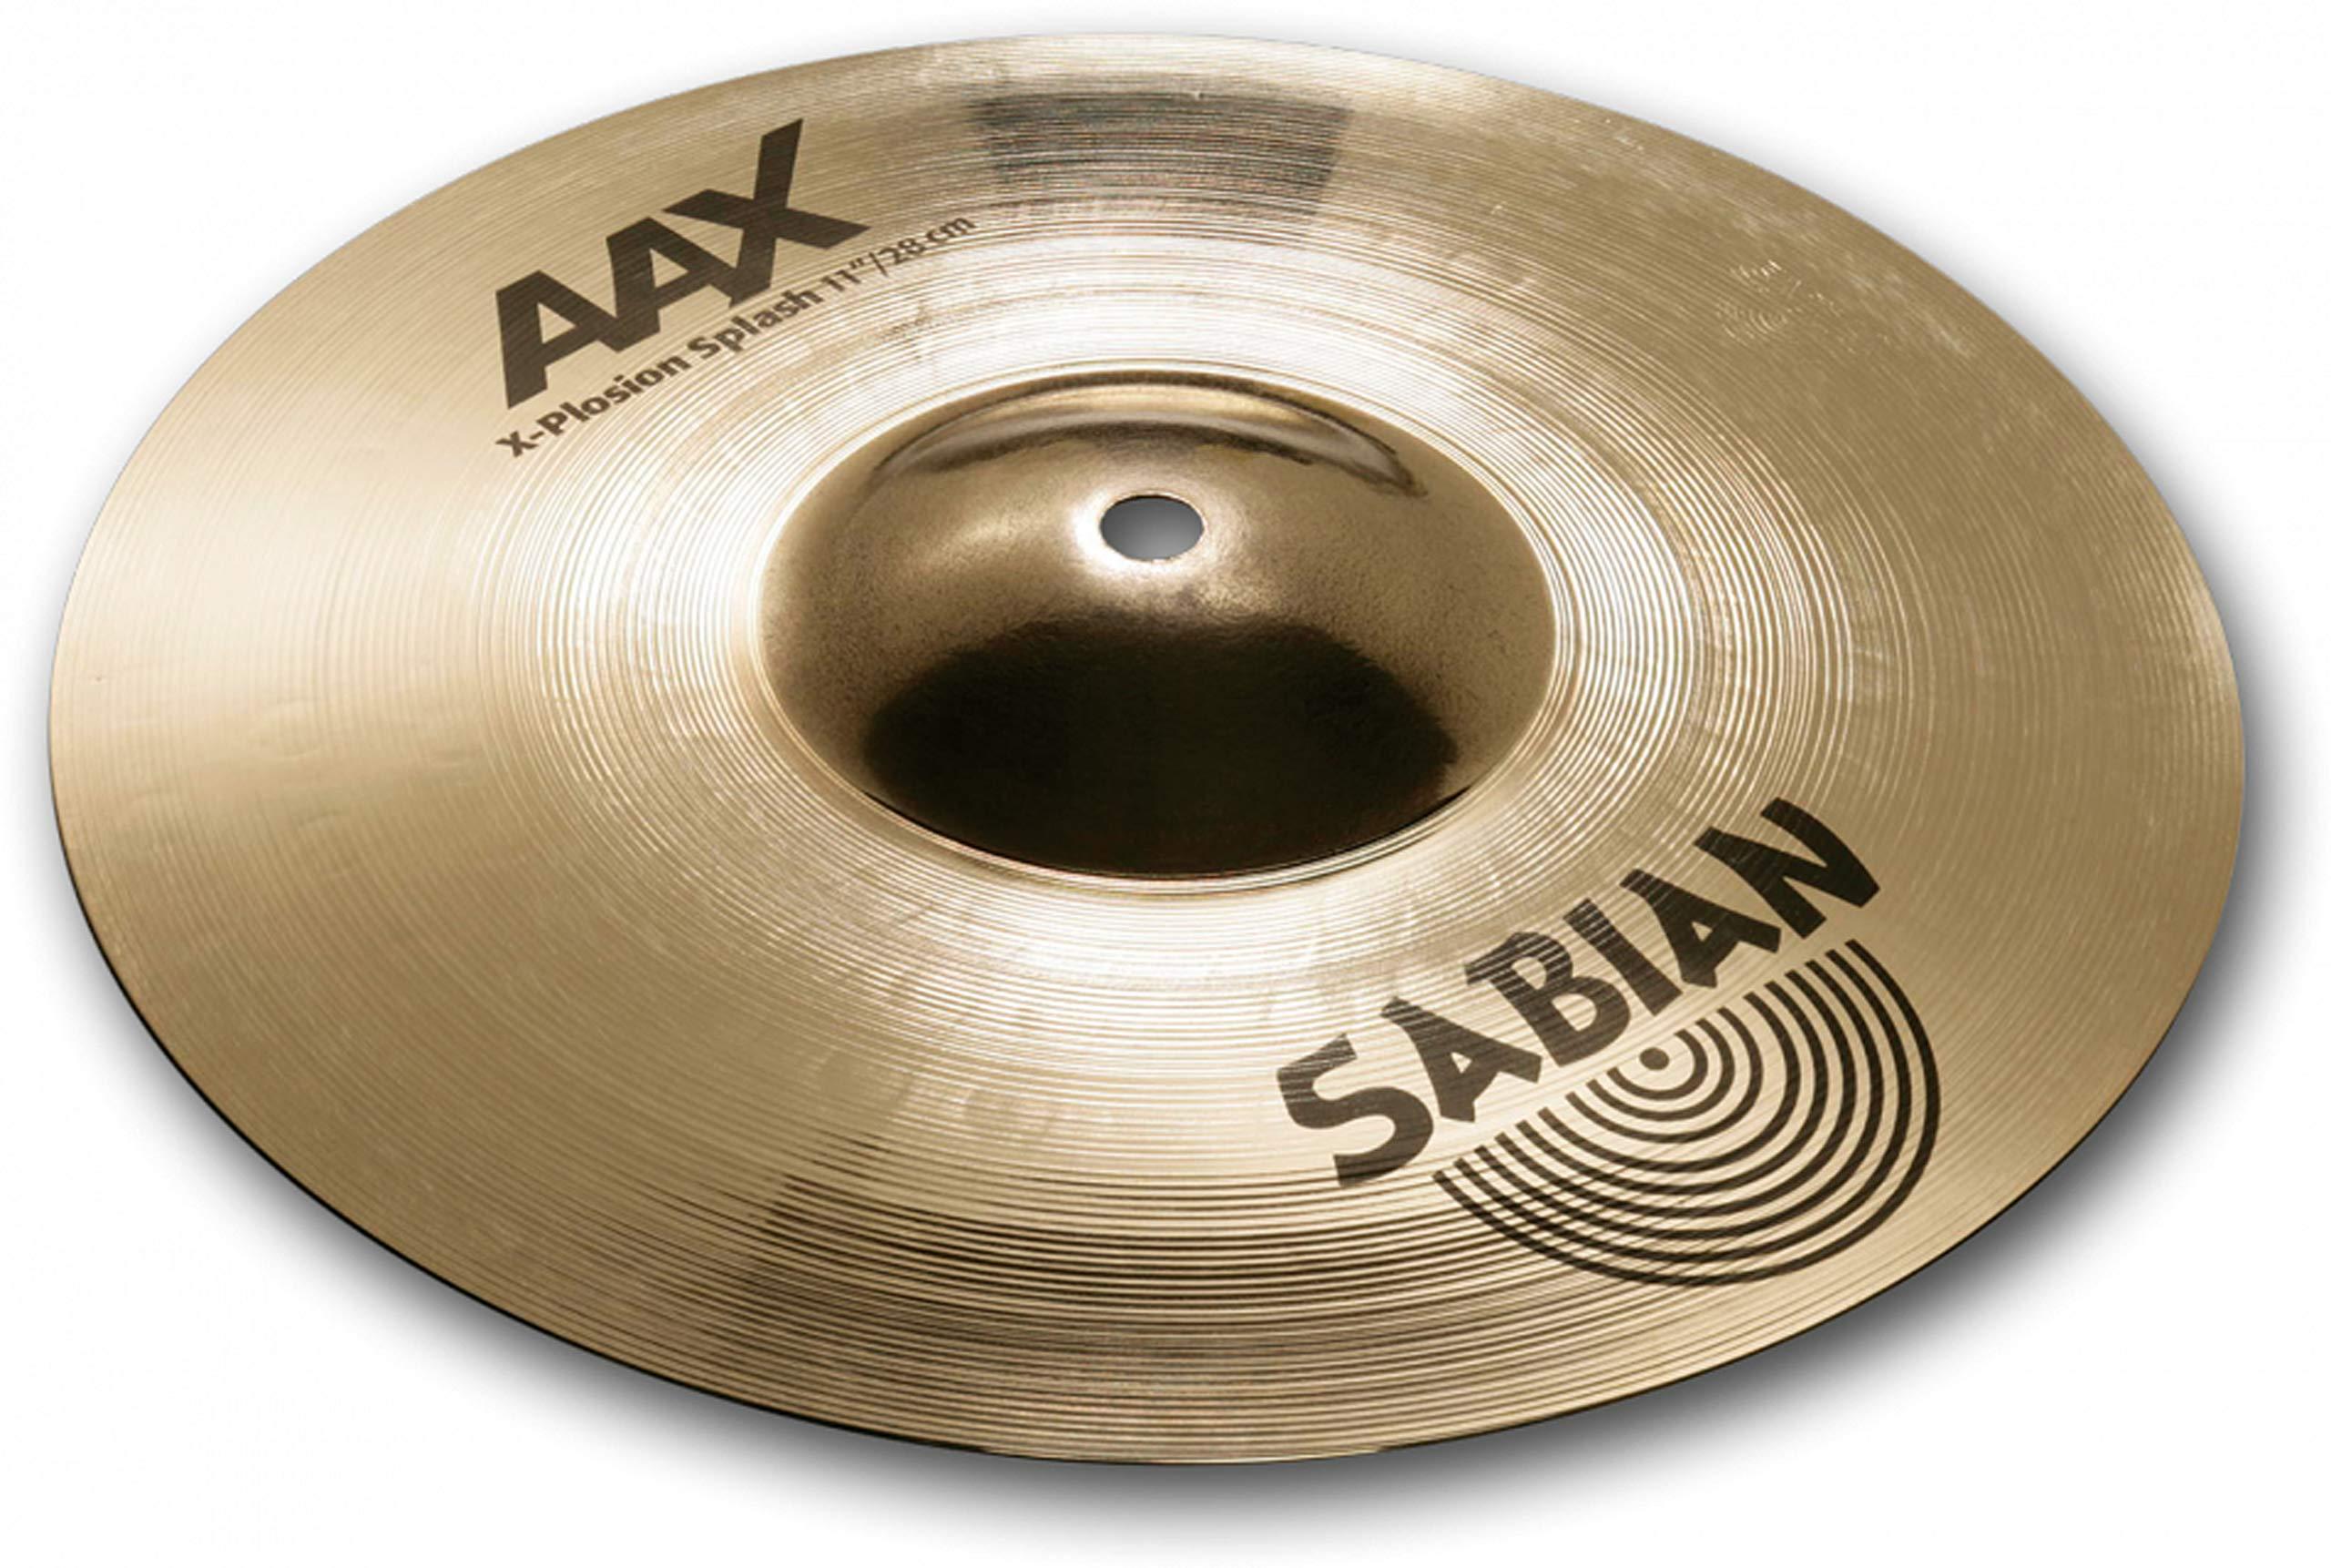 Sabian AAX 11'' X-Plosion Splash Cymbal, Brilliant Finish by Sabian